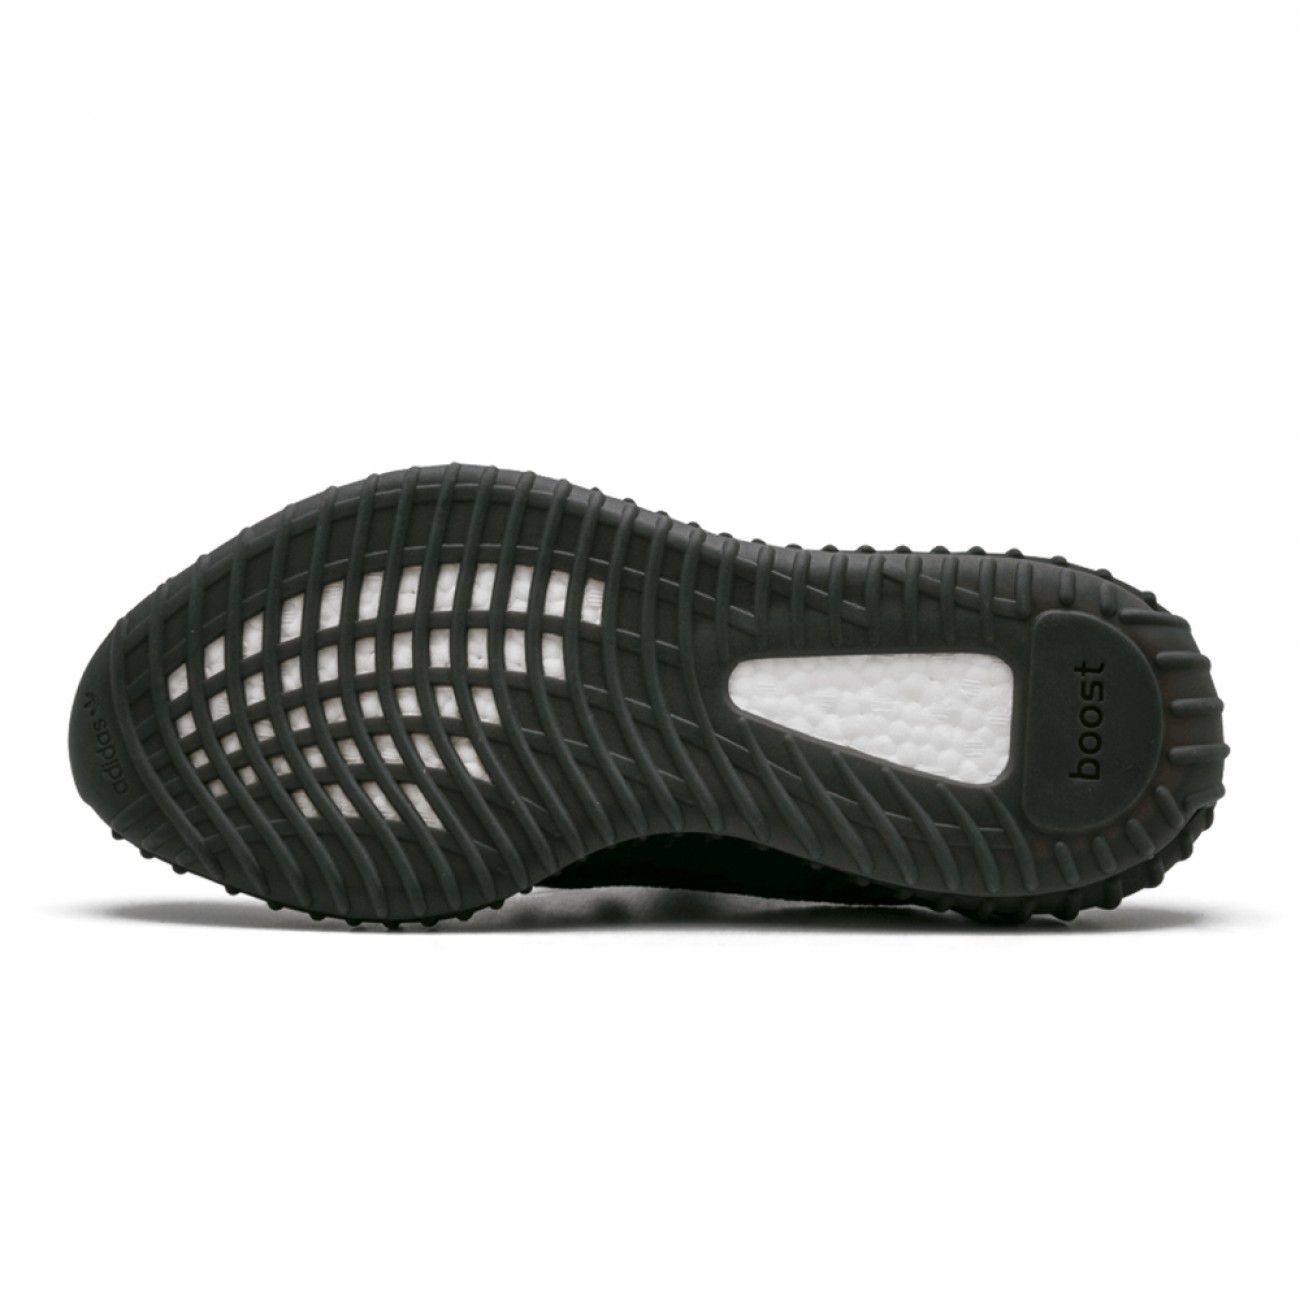 867f0aca95048e 45c45 6b506  store adidas yeezy boost sply 350 v2 black running shoes 2b85a  7e170